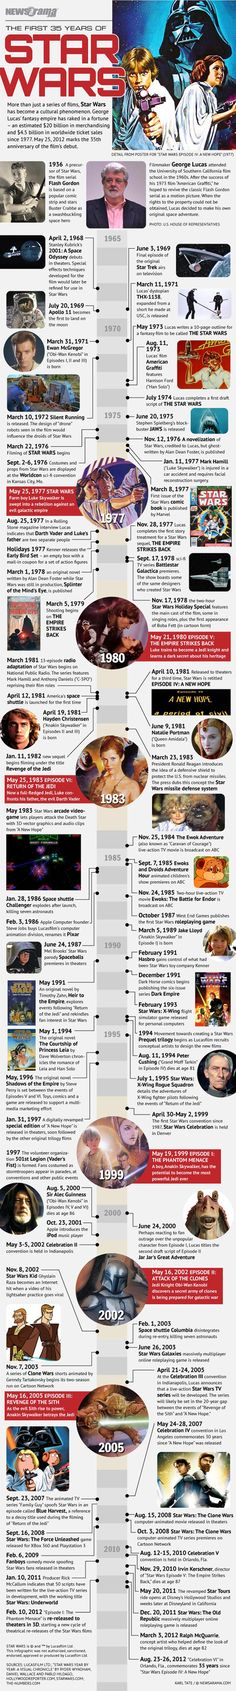 Happy 35th Anniversary Star Wars